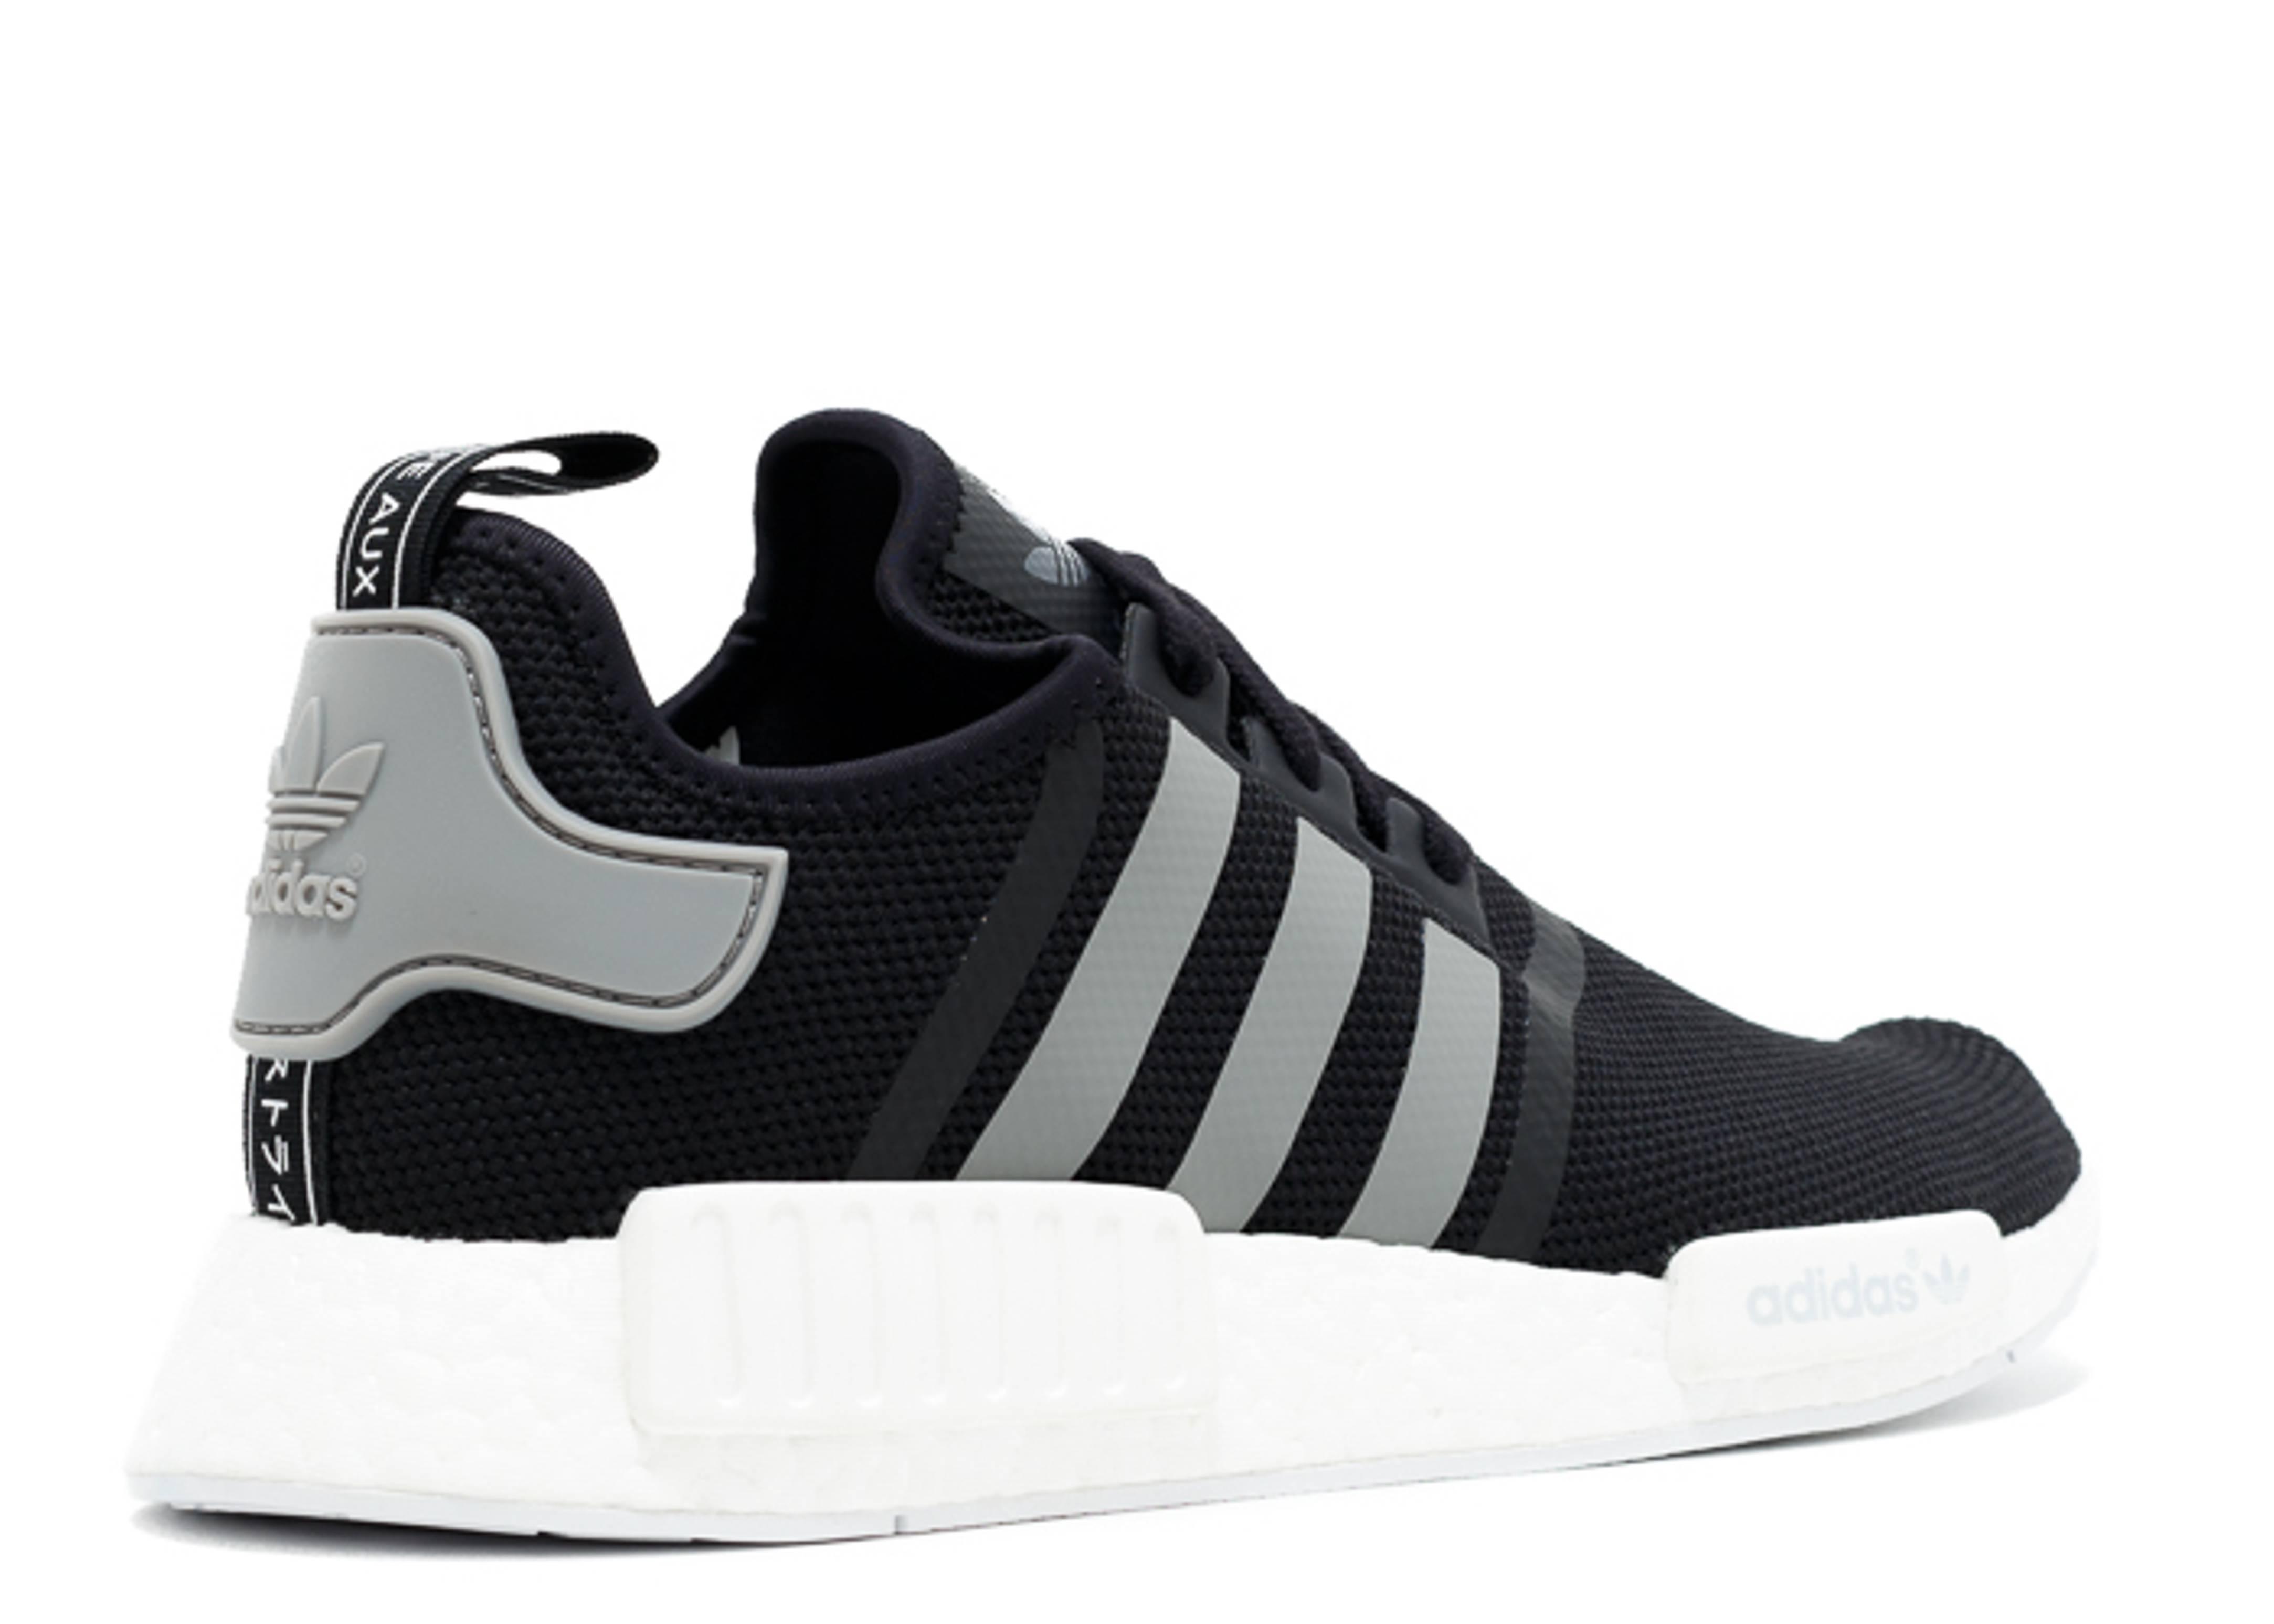 Adidas Nmd Black White Grey